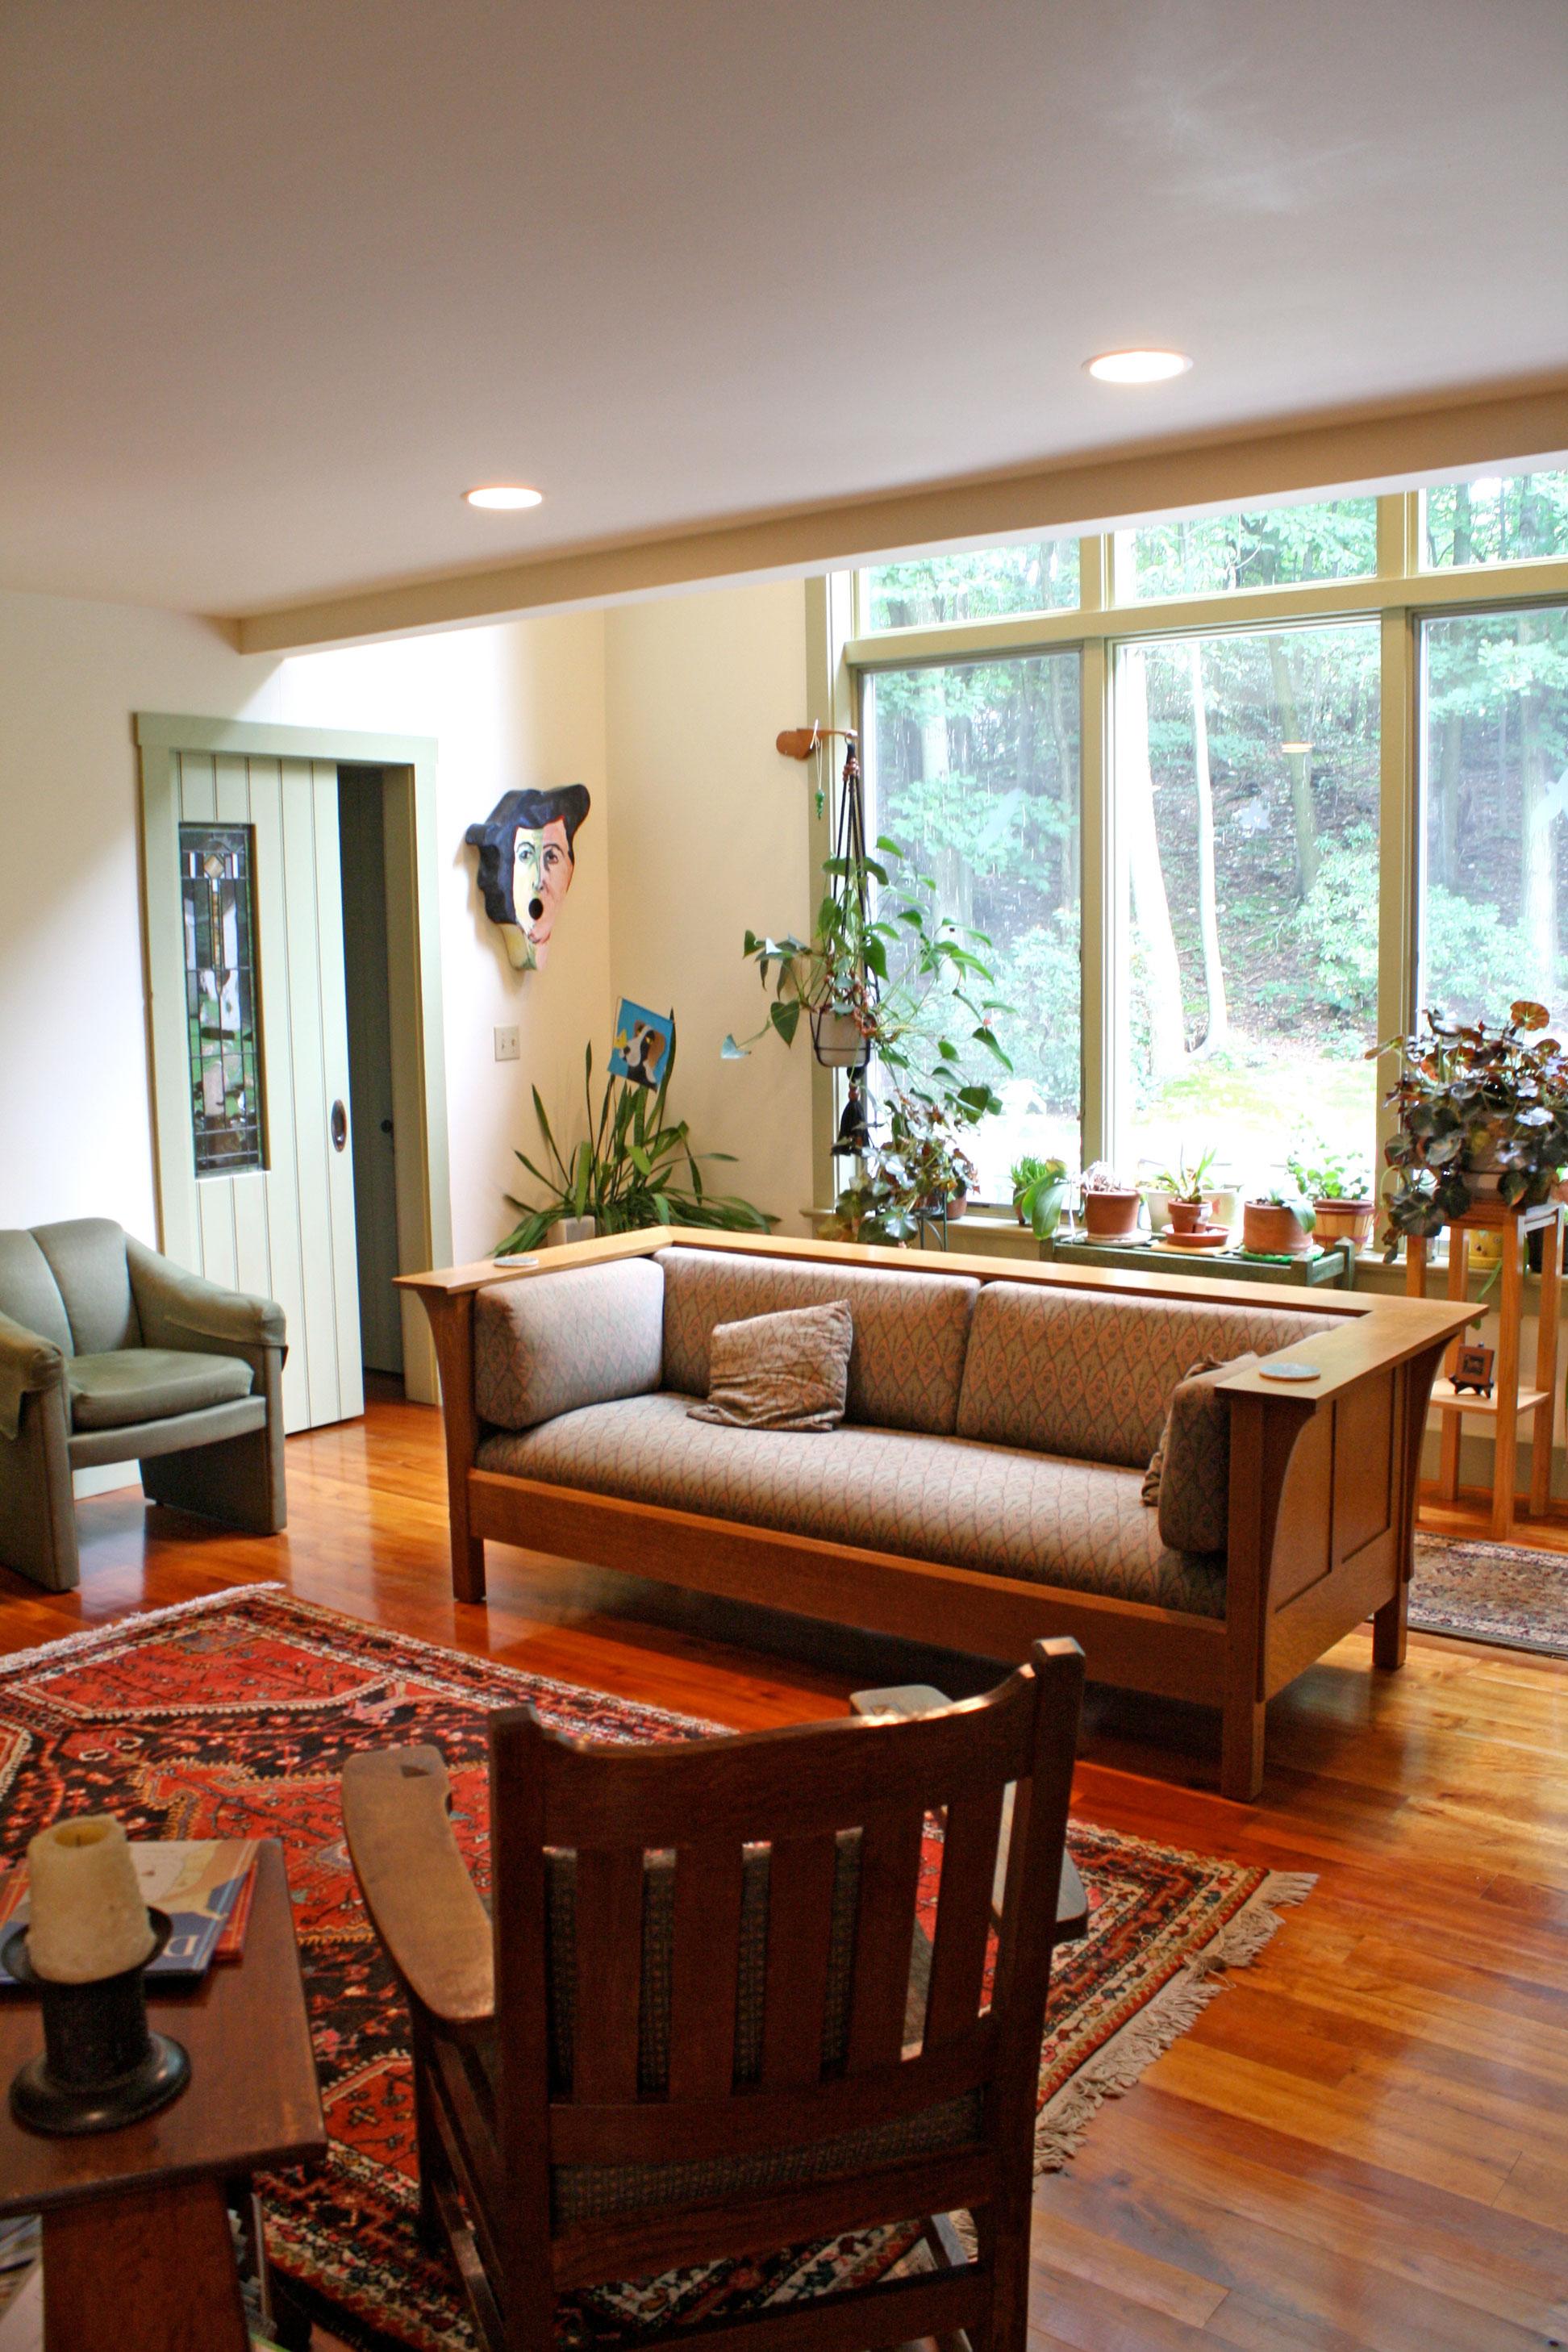 craftsmen-living-room-2.jpg